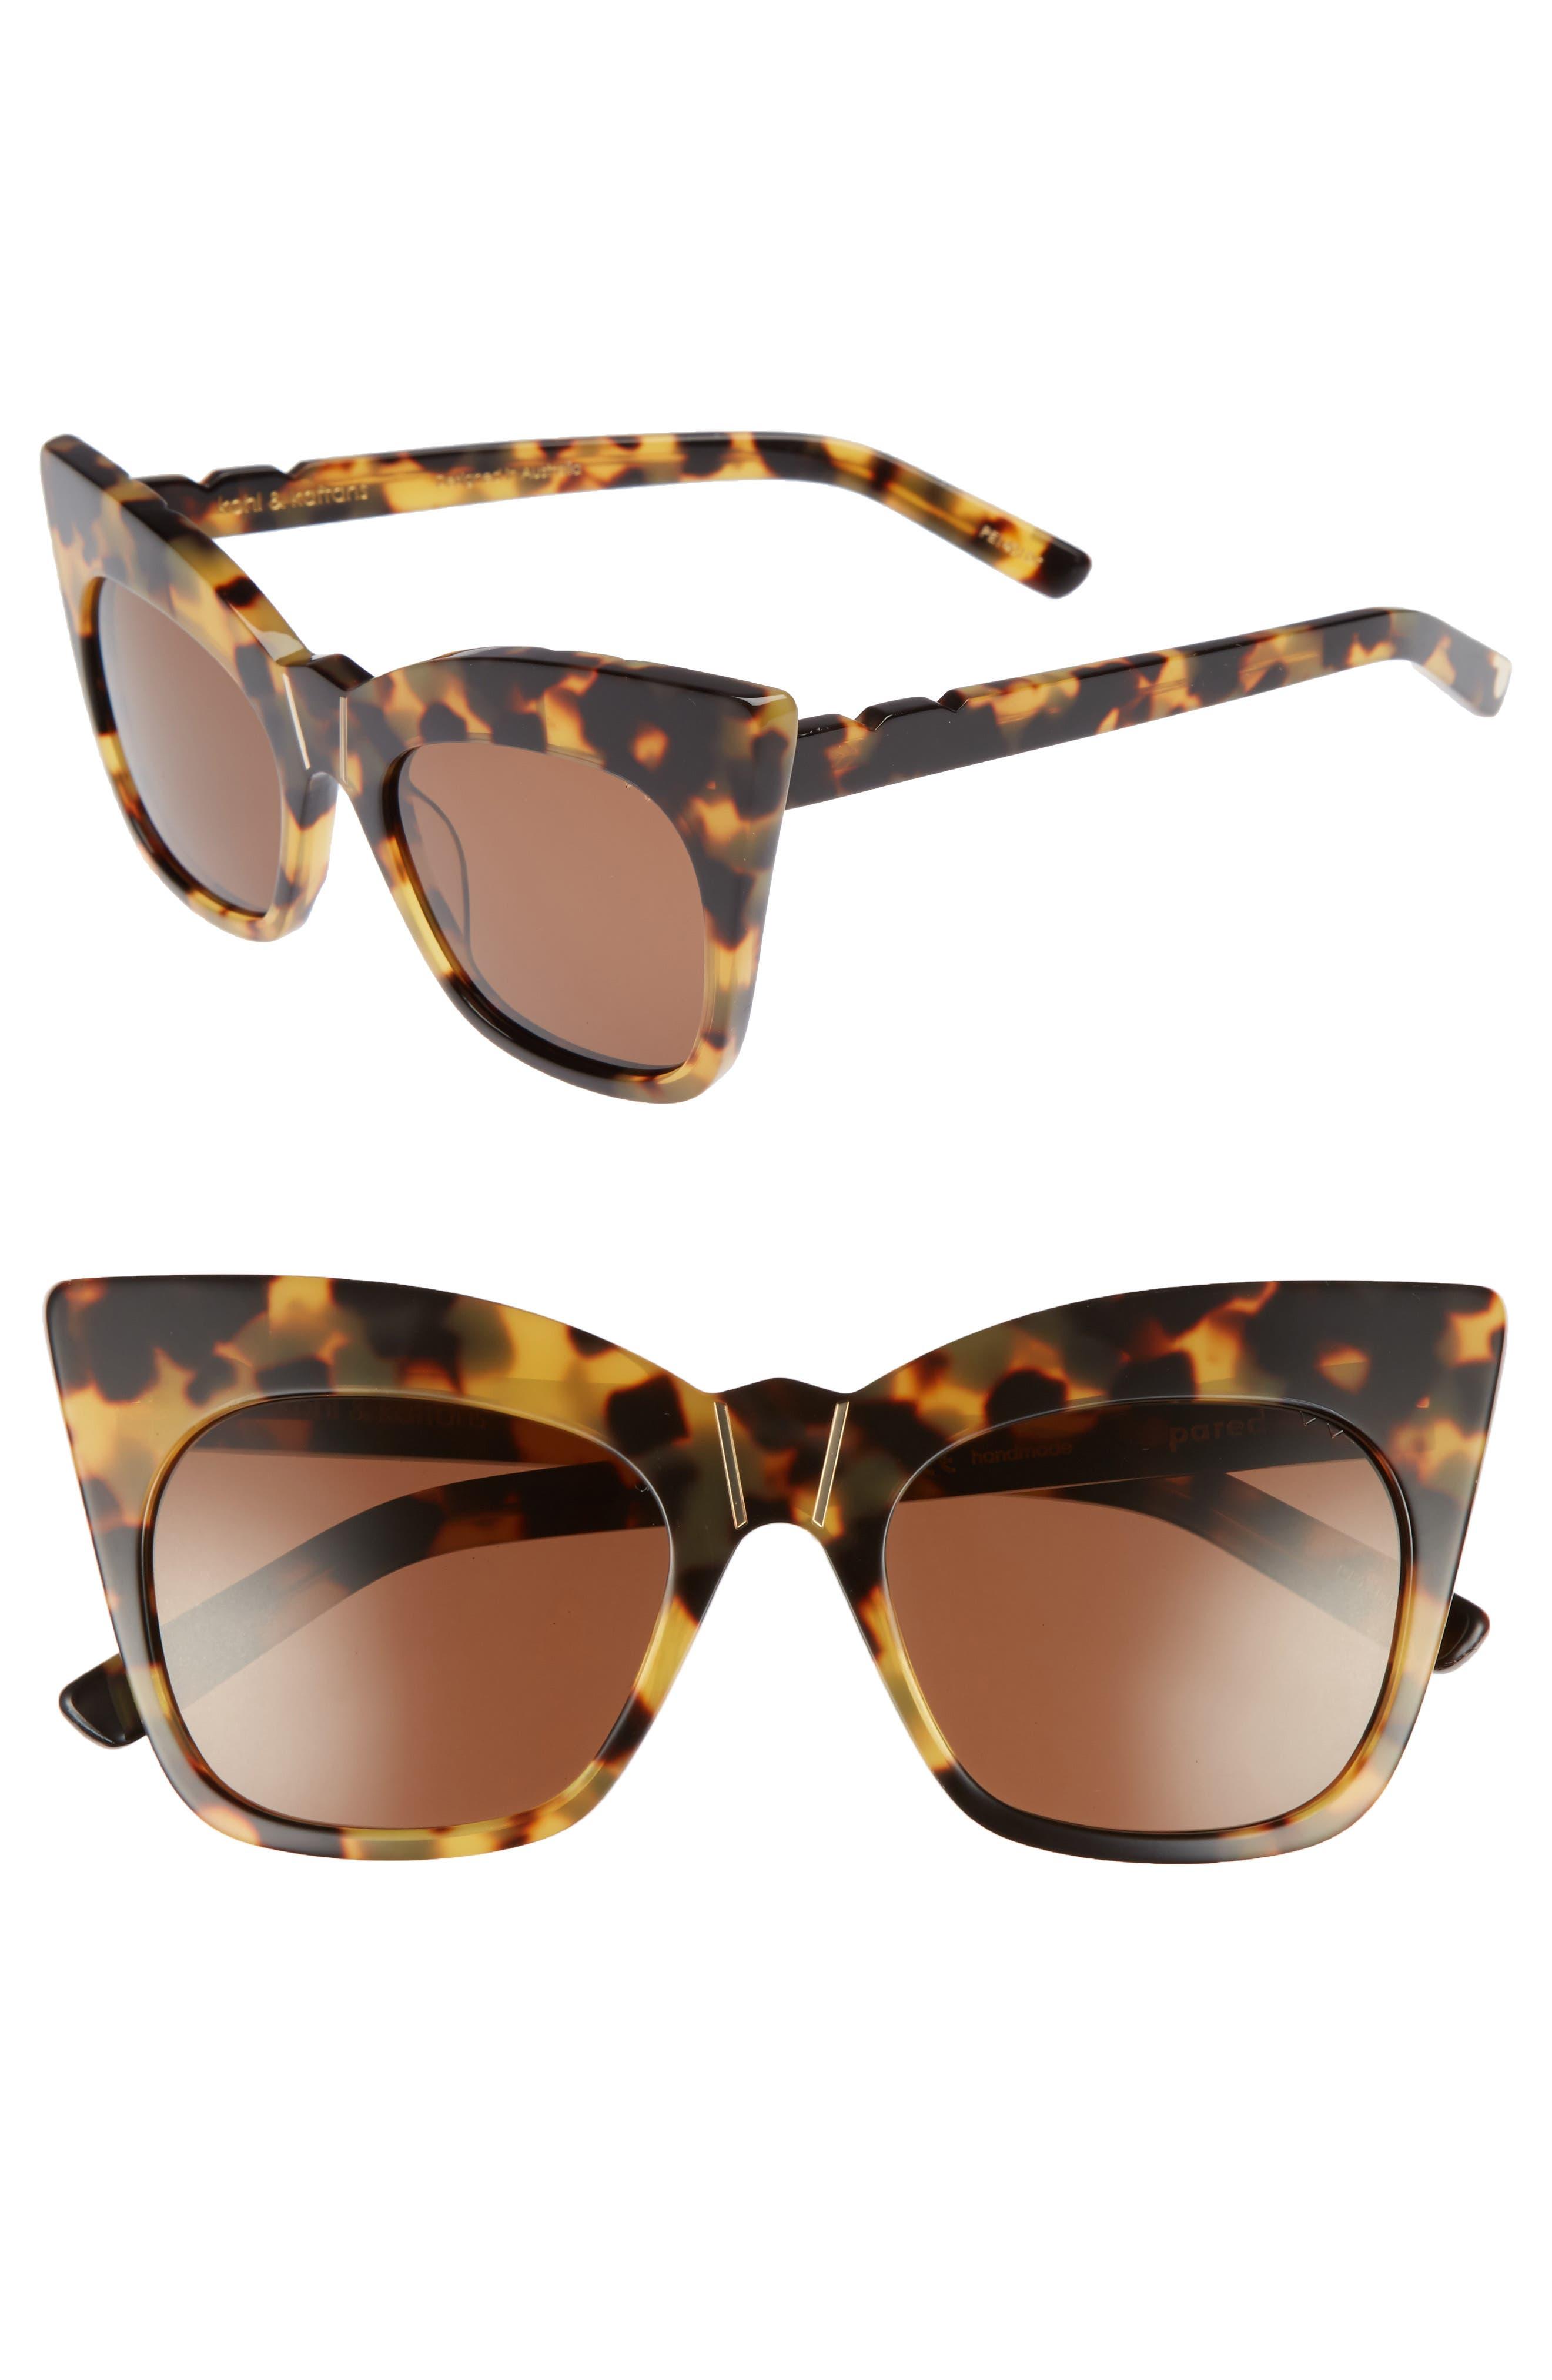 Kohl & Kaftans 52mm Cat Eye Sunglasses,                             Main thumbnail 1, color,                             203